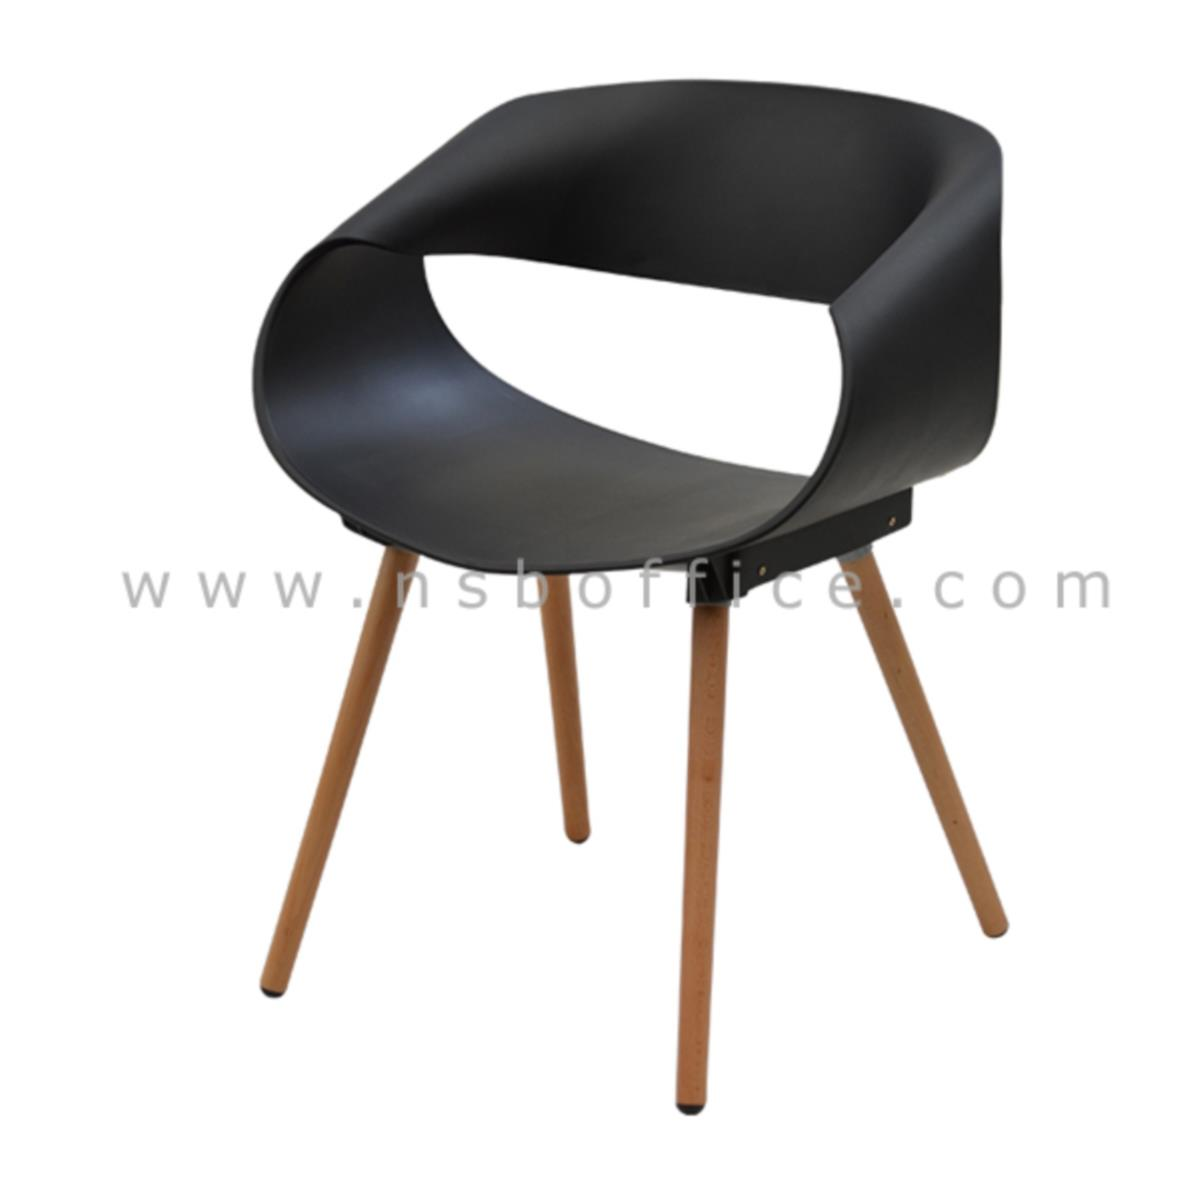 B29A253:เก้าอี้โมเดิร์นพลาสติก(PP) รุ่น PN-9821 ขนาด 61W cm. โครงขาไม้